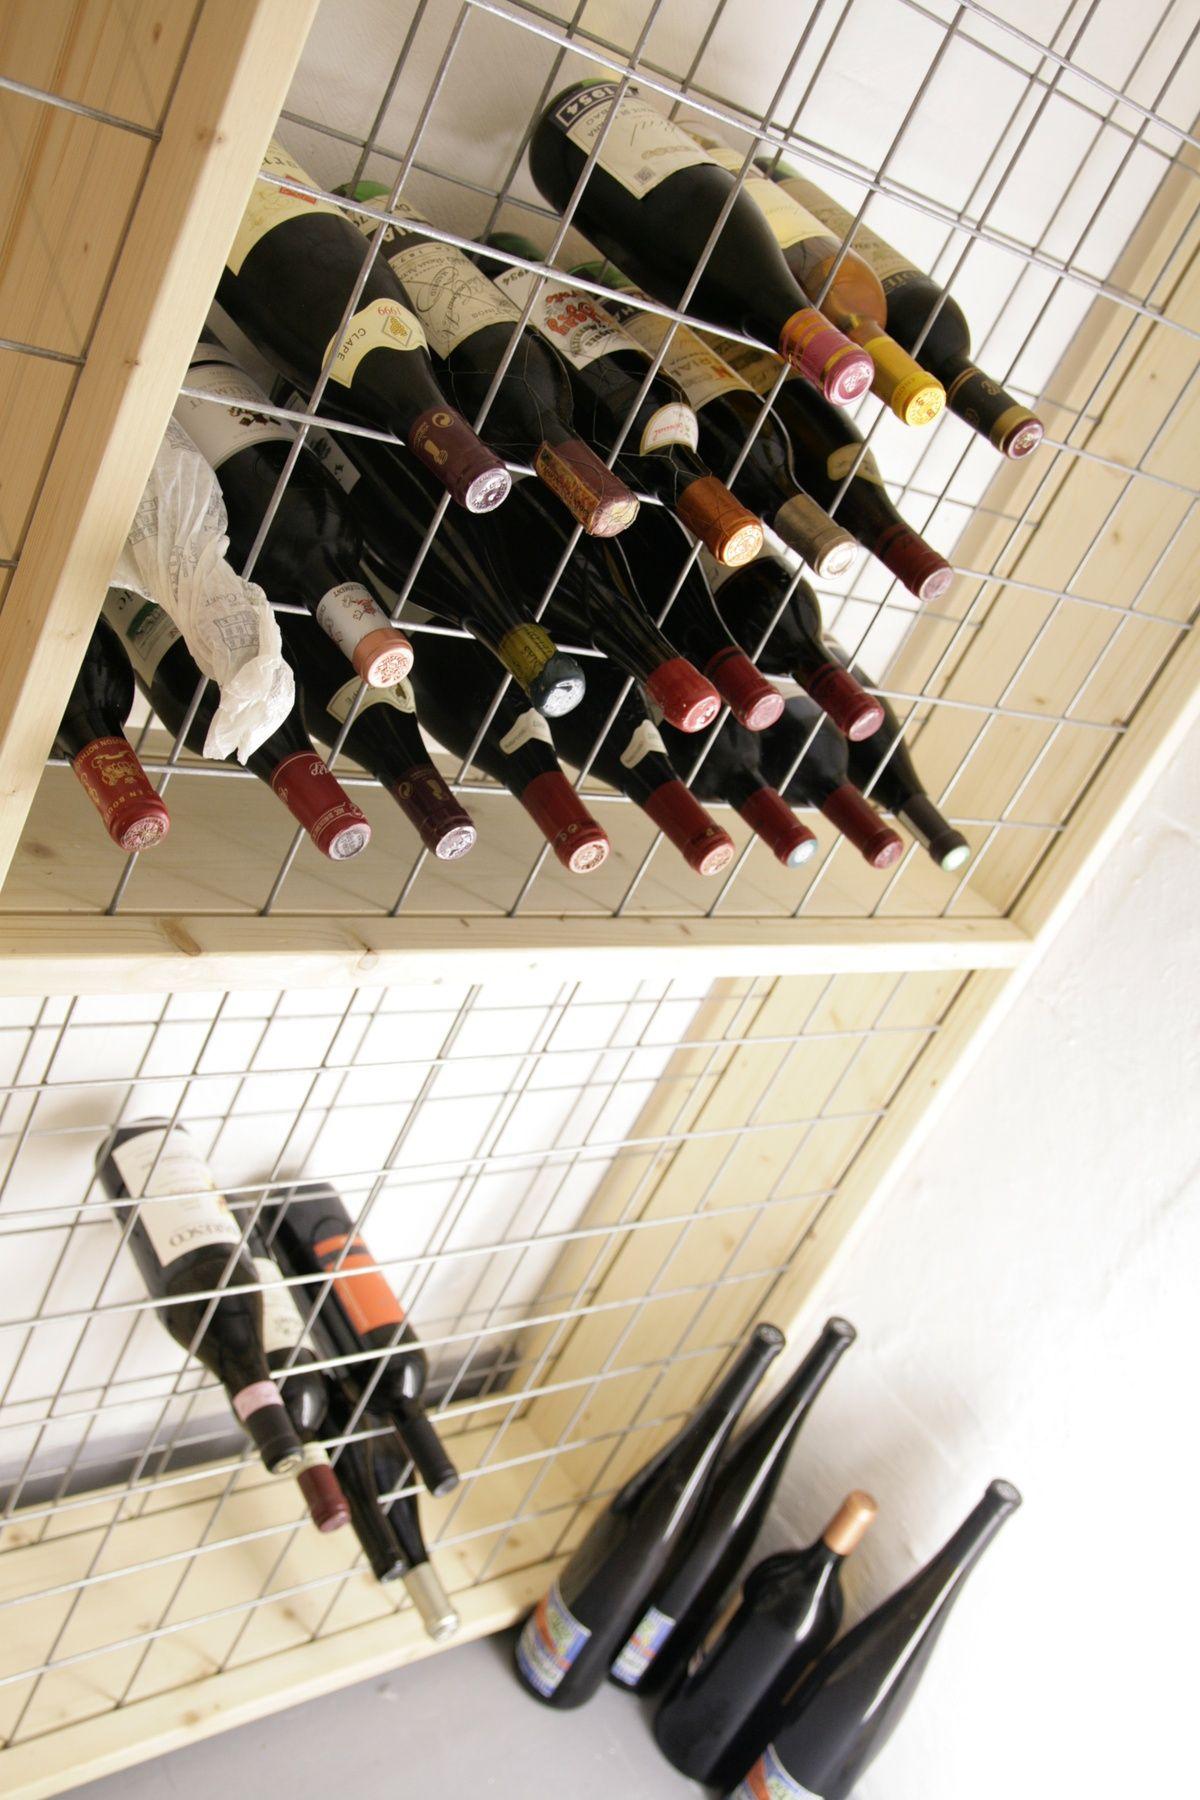 33887bd24ecffb189fc2a5e62b0db873 Jpg 1 200 1 800 Pixels Custom Wine Rack Wine Rack Wire Wine Rack